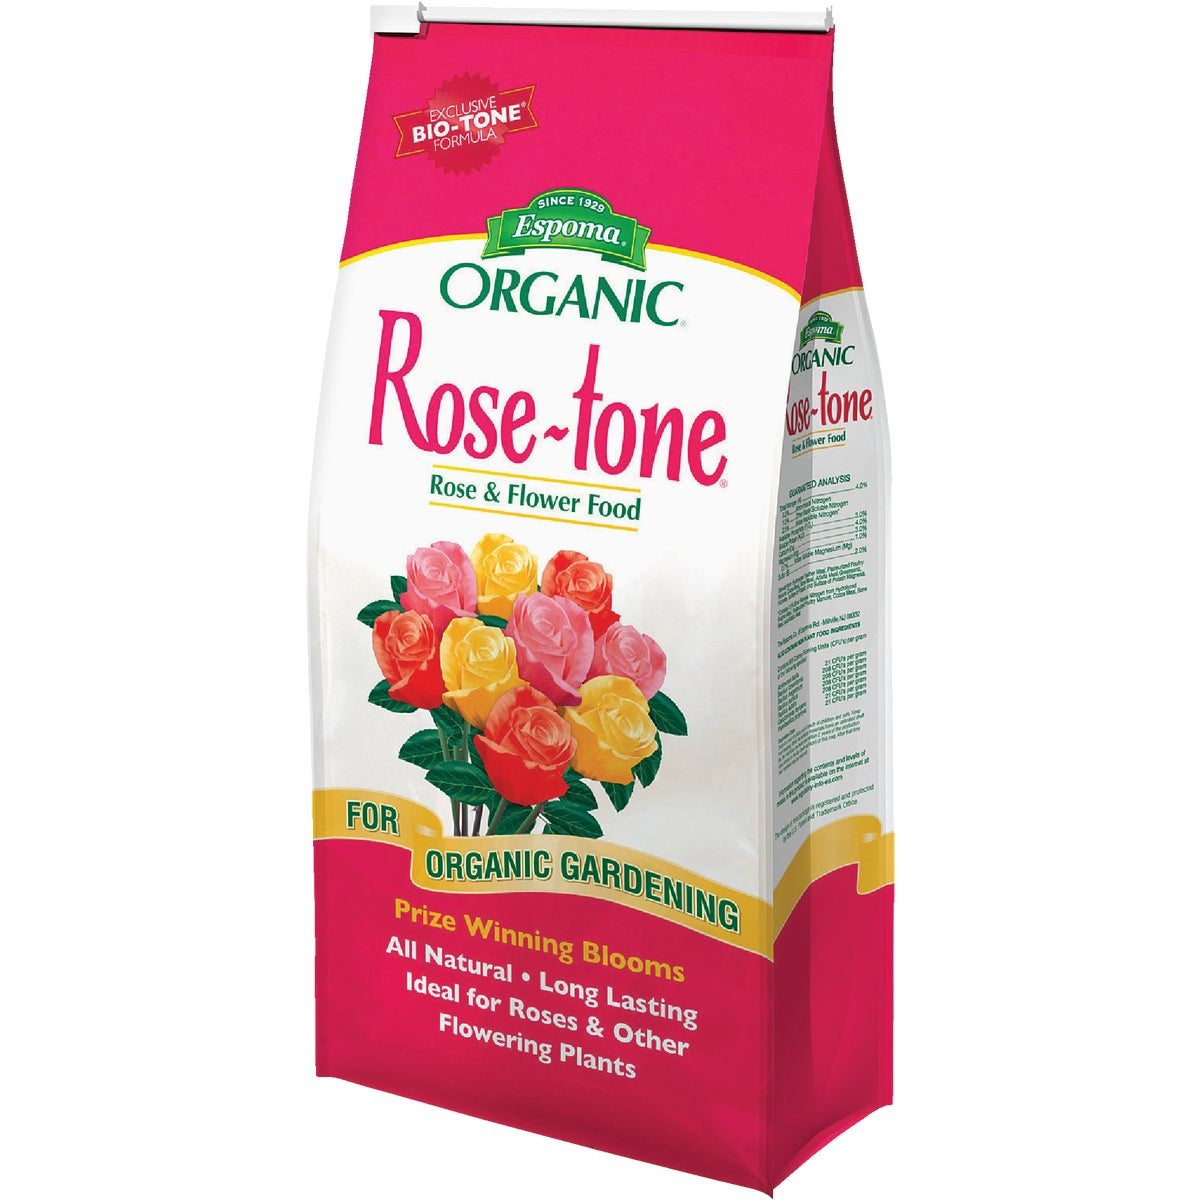 8LB ROSE TONE